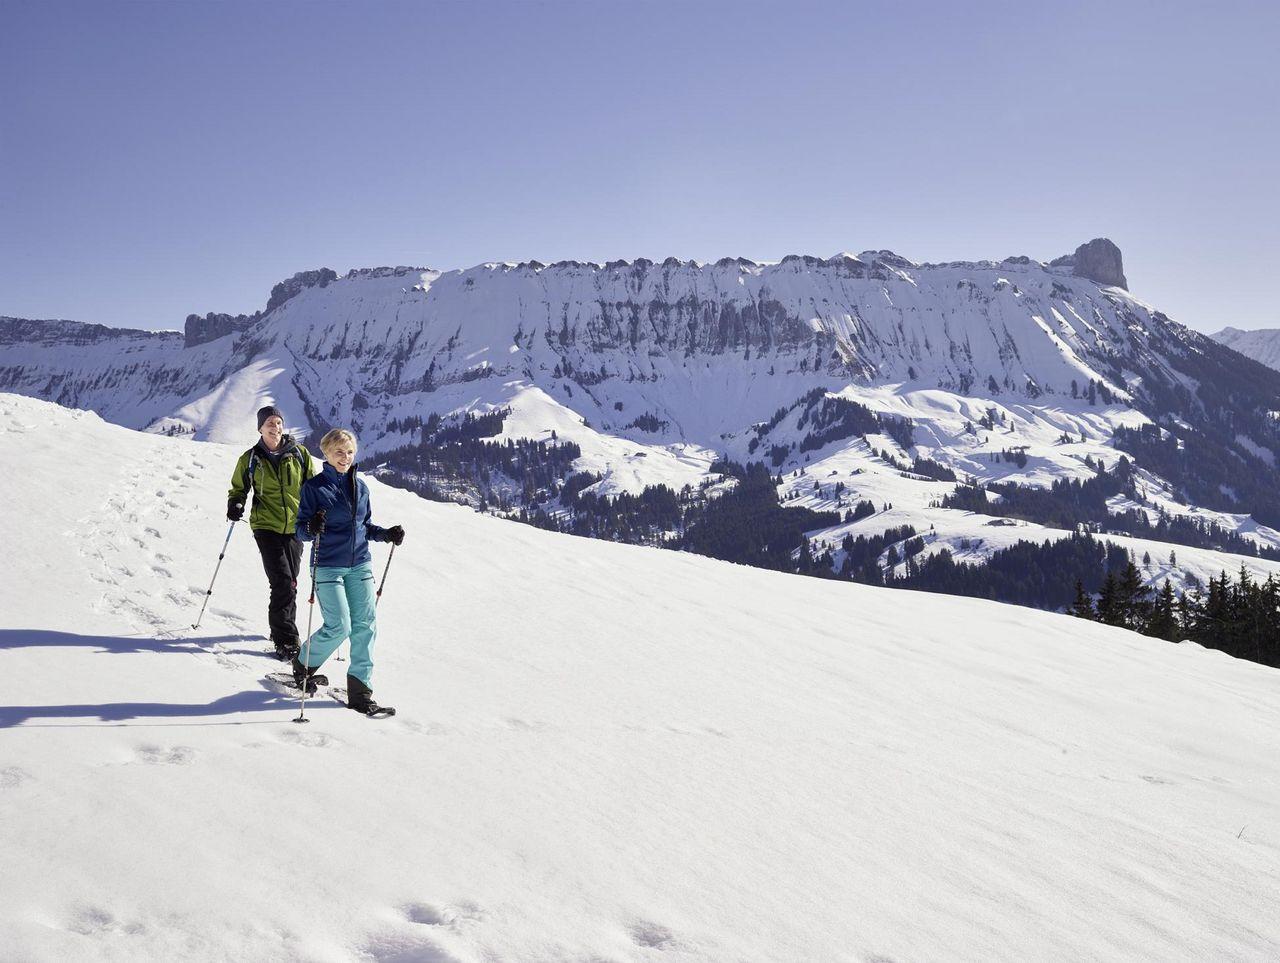 Schneeschuhtour durch Unesco Biosphäre